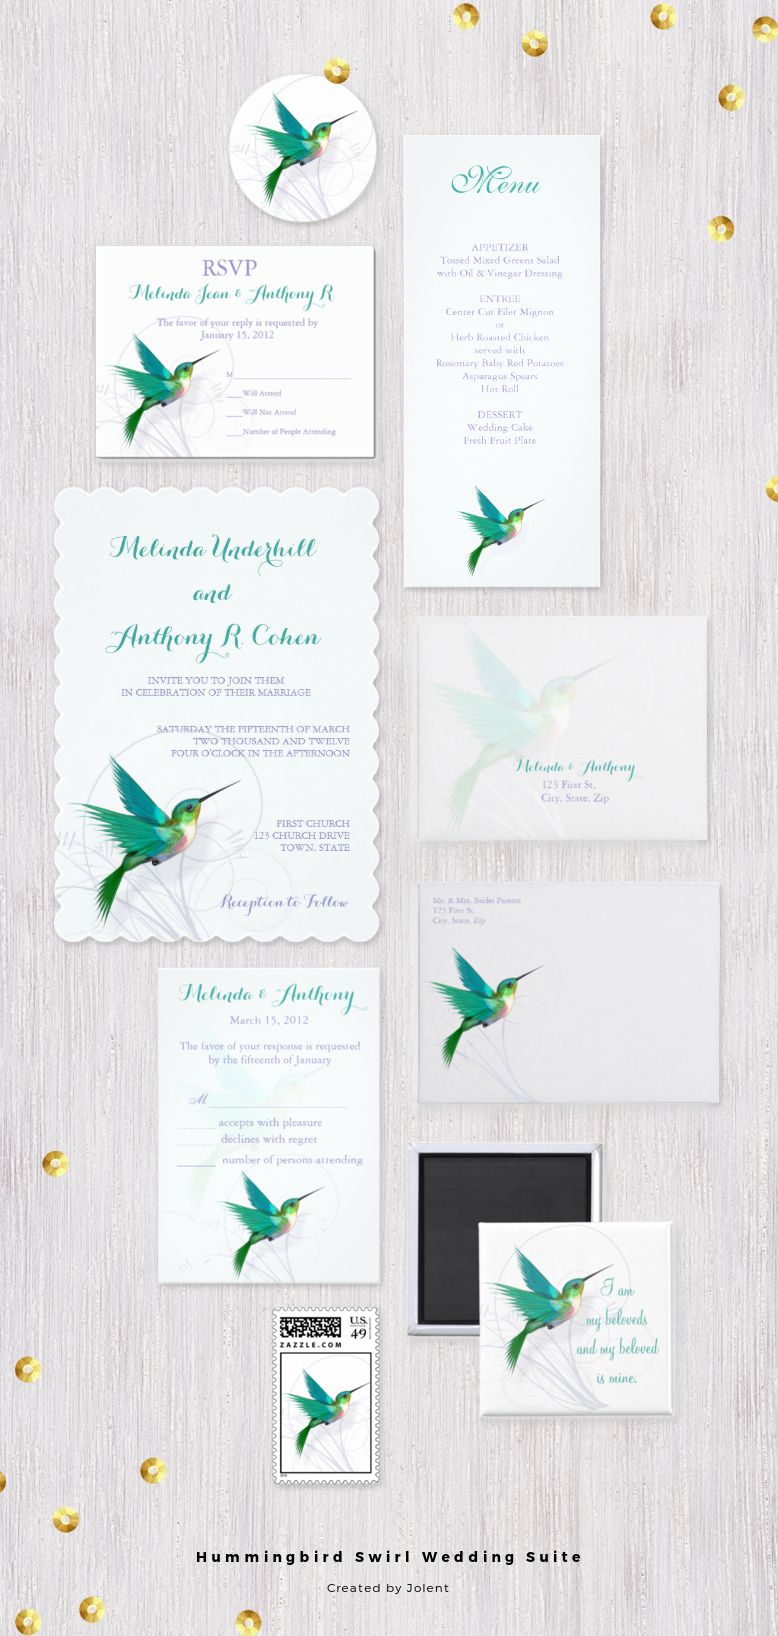 Hummingbird Swirl - This beautiful customizable Wedding Invitation ...